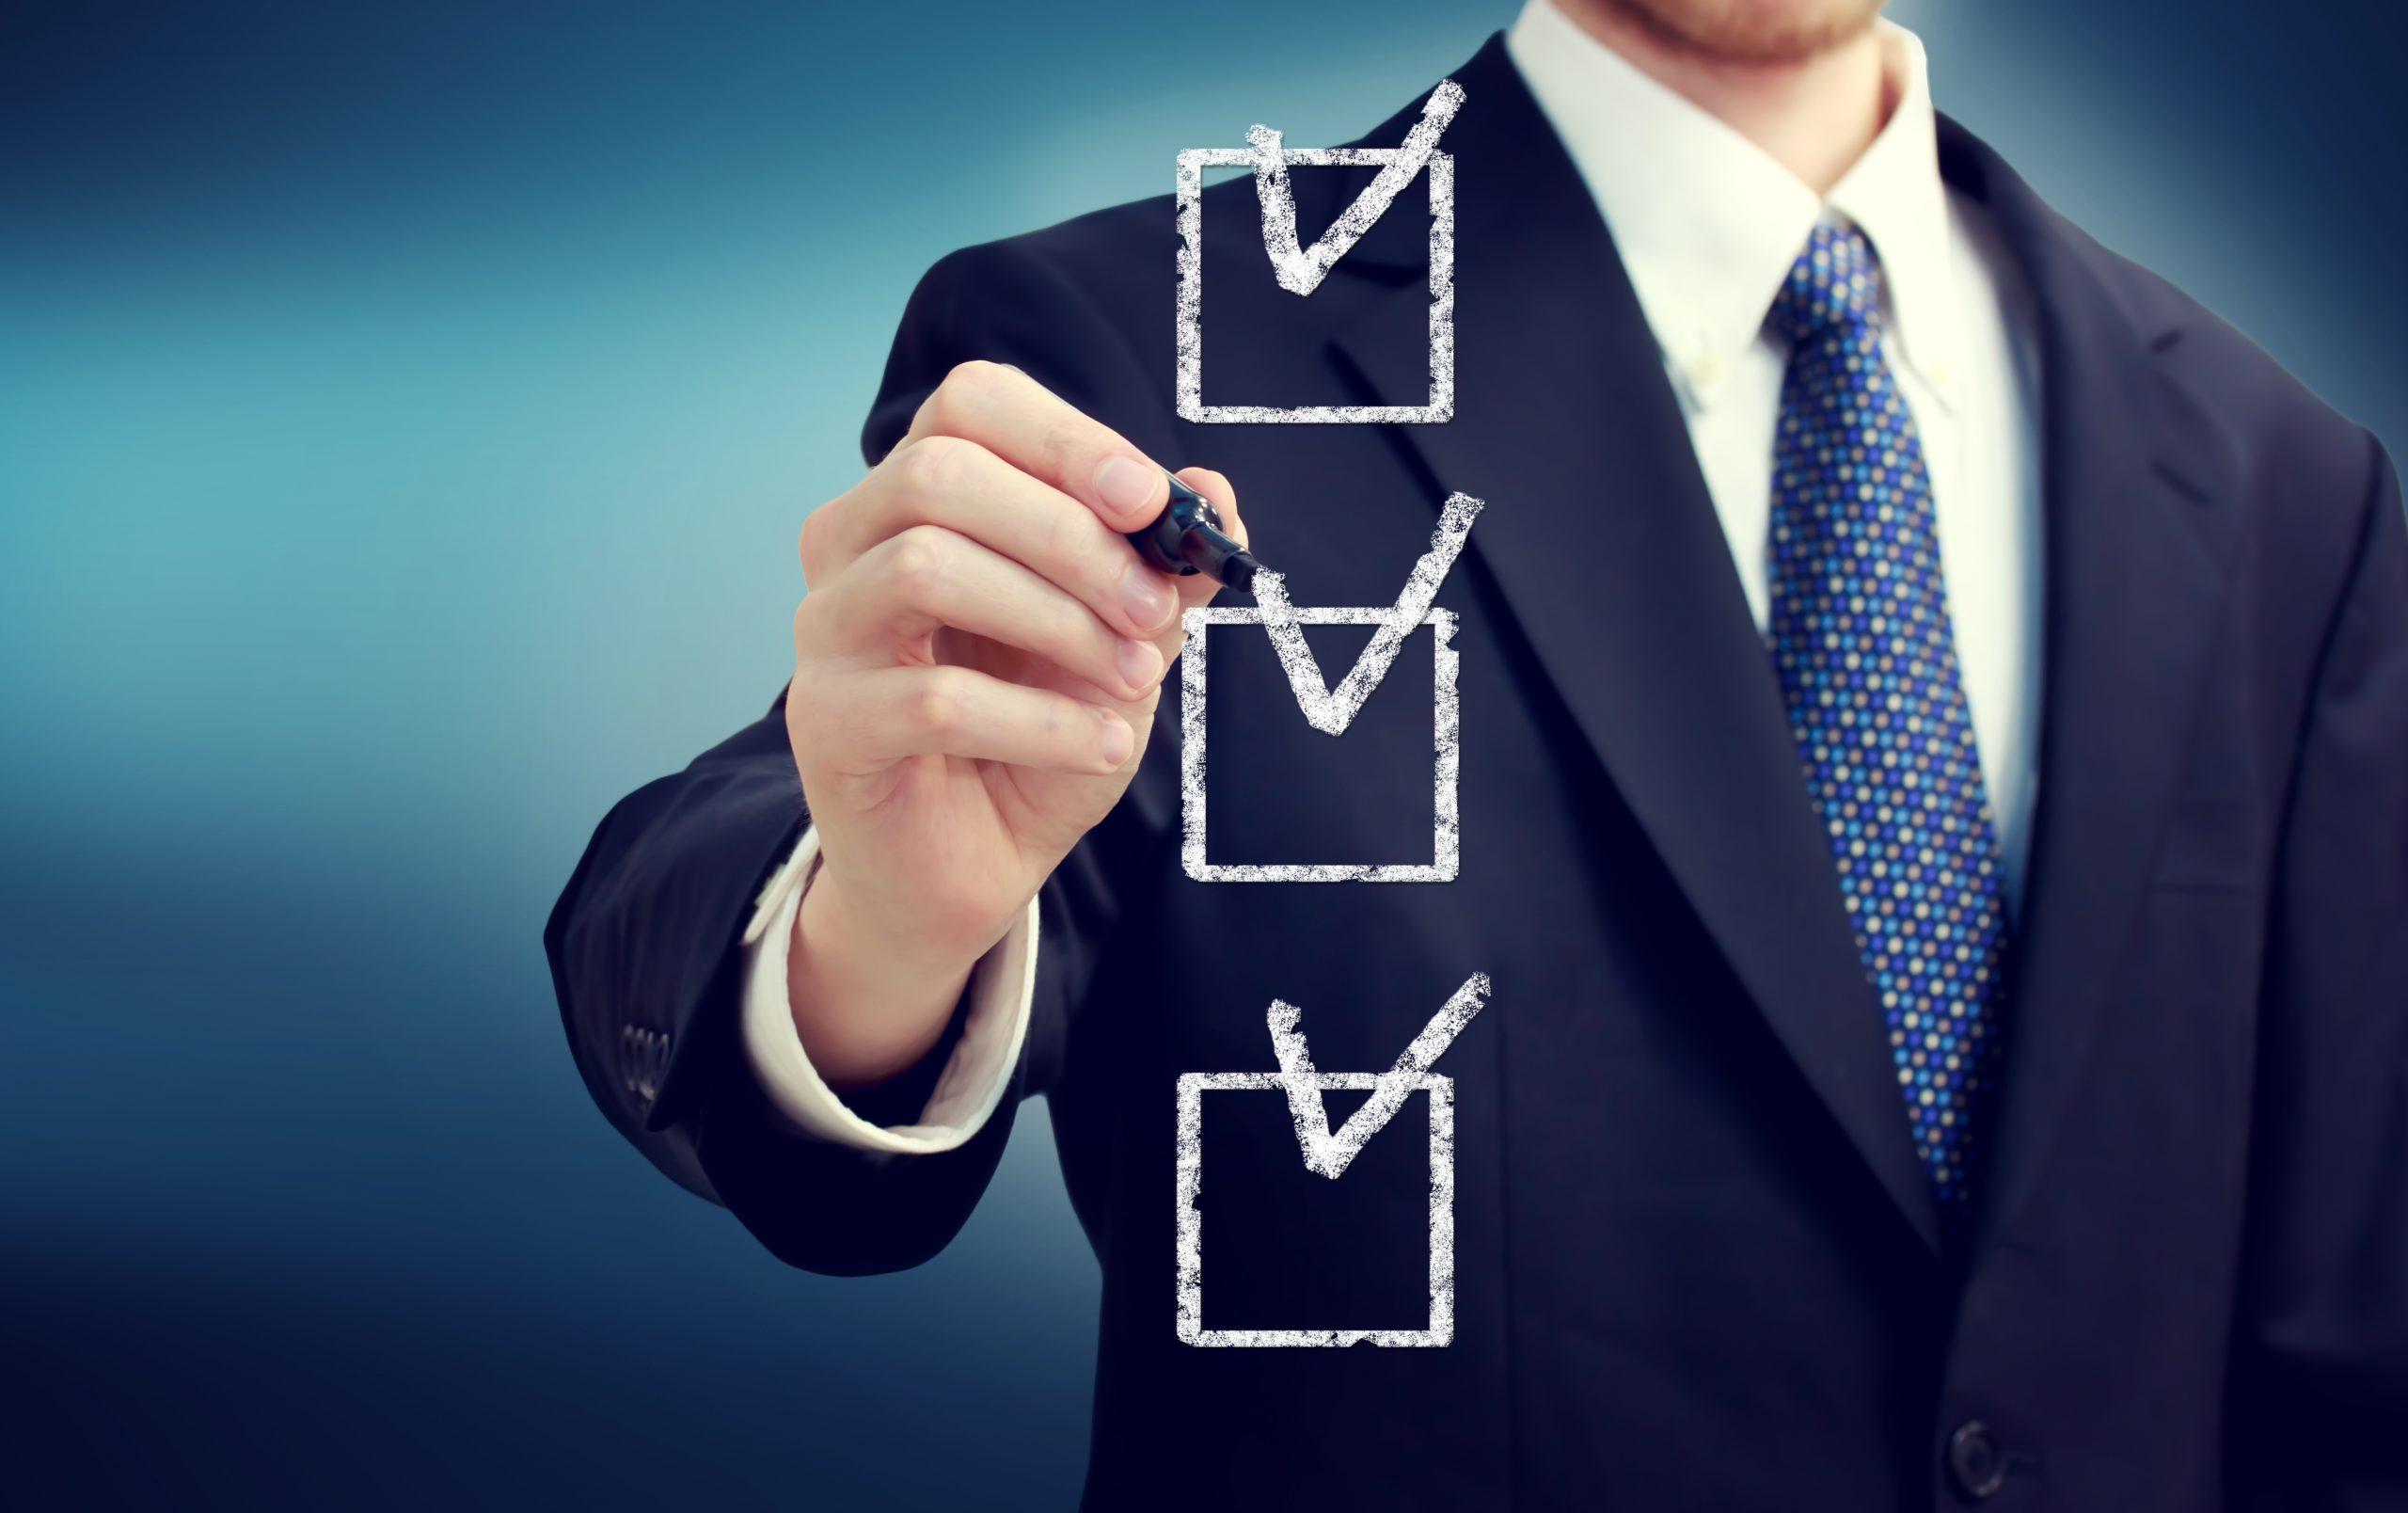 Steps to Take When Probating an Estate